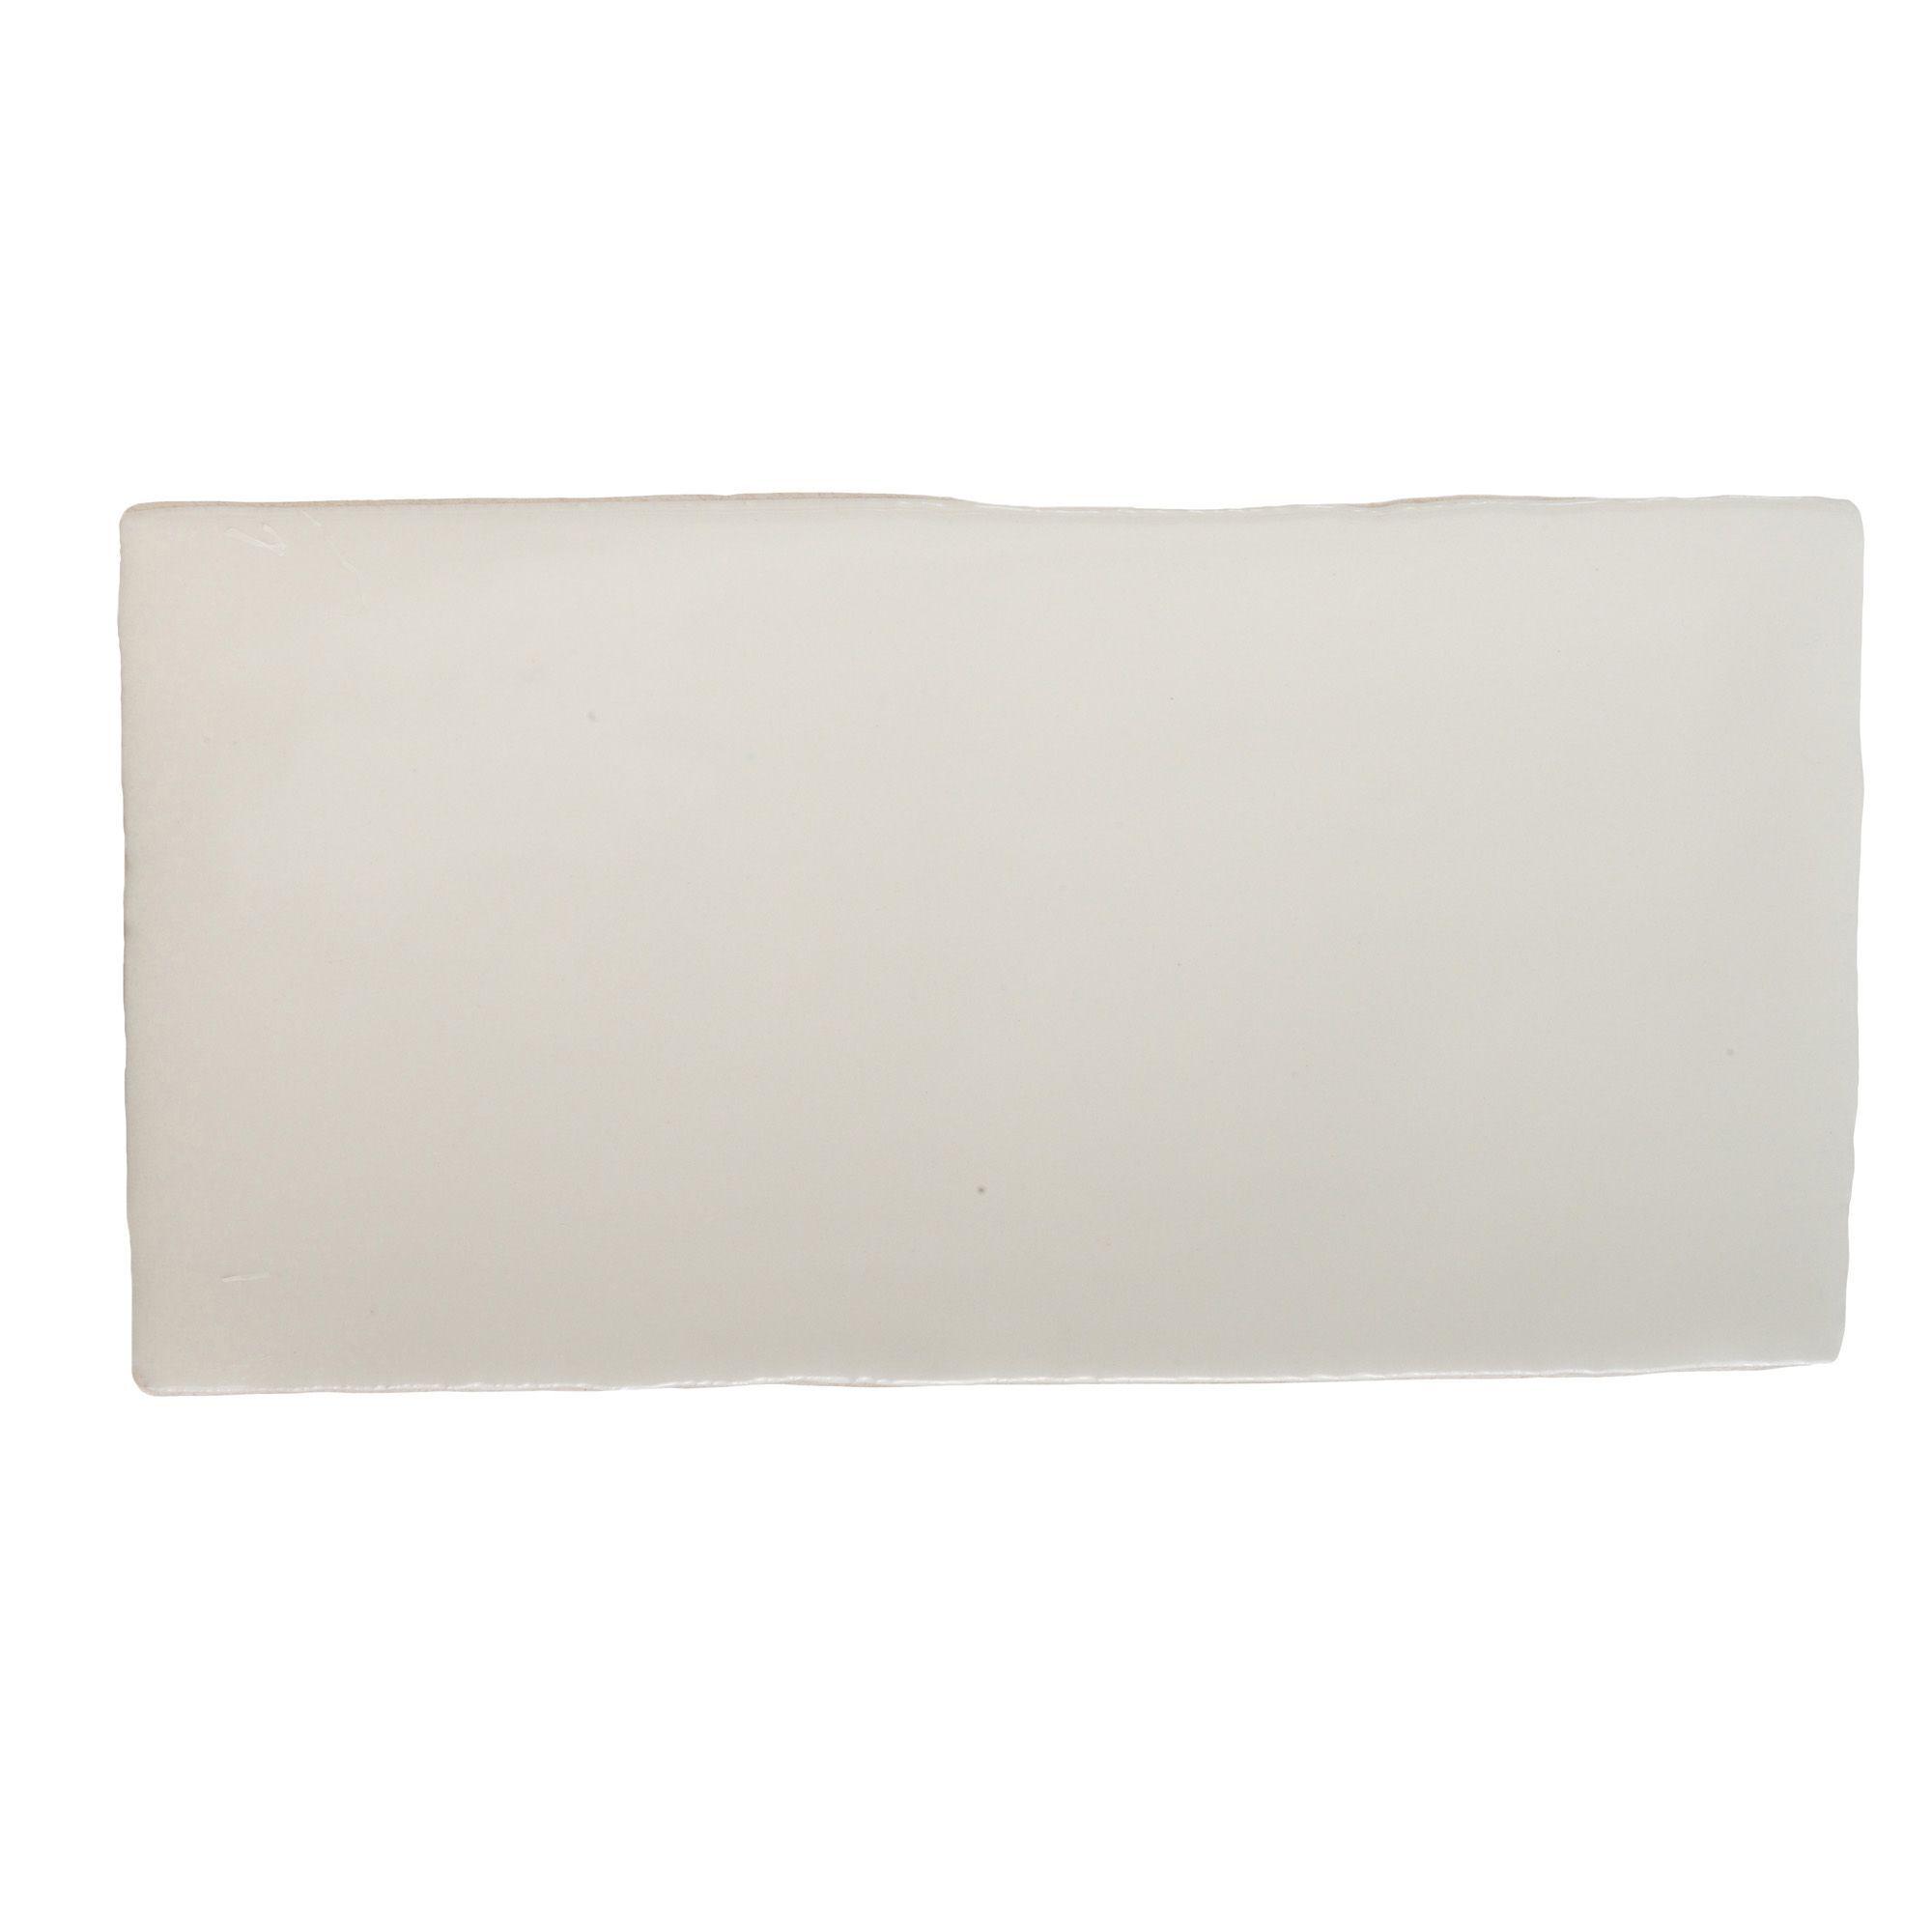 Bq Ceramic Kitchen Floor Tiles Padstow Cream Ceramic Wall Tile Pack Of 44 L150mm W75mm